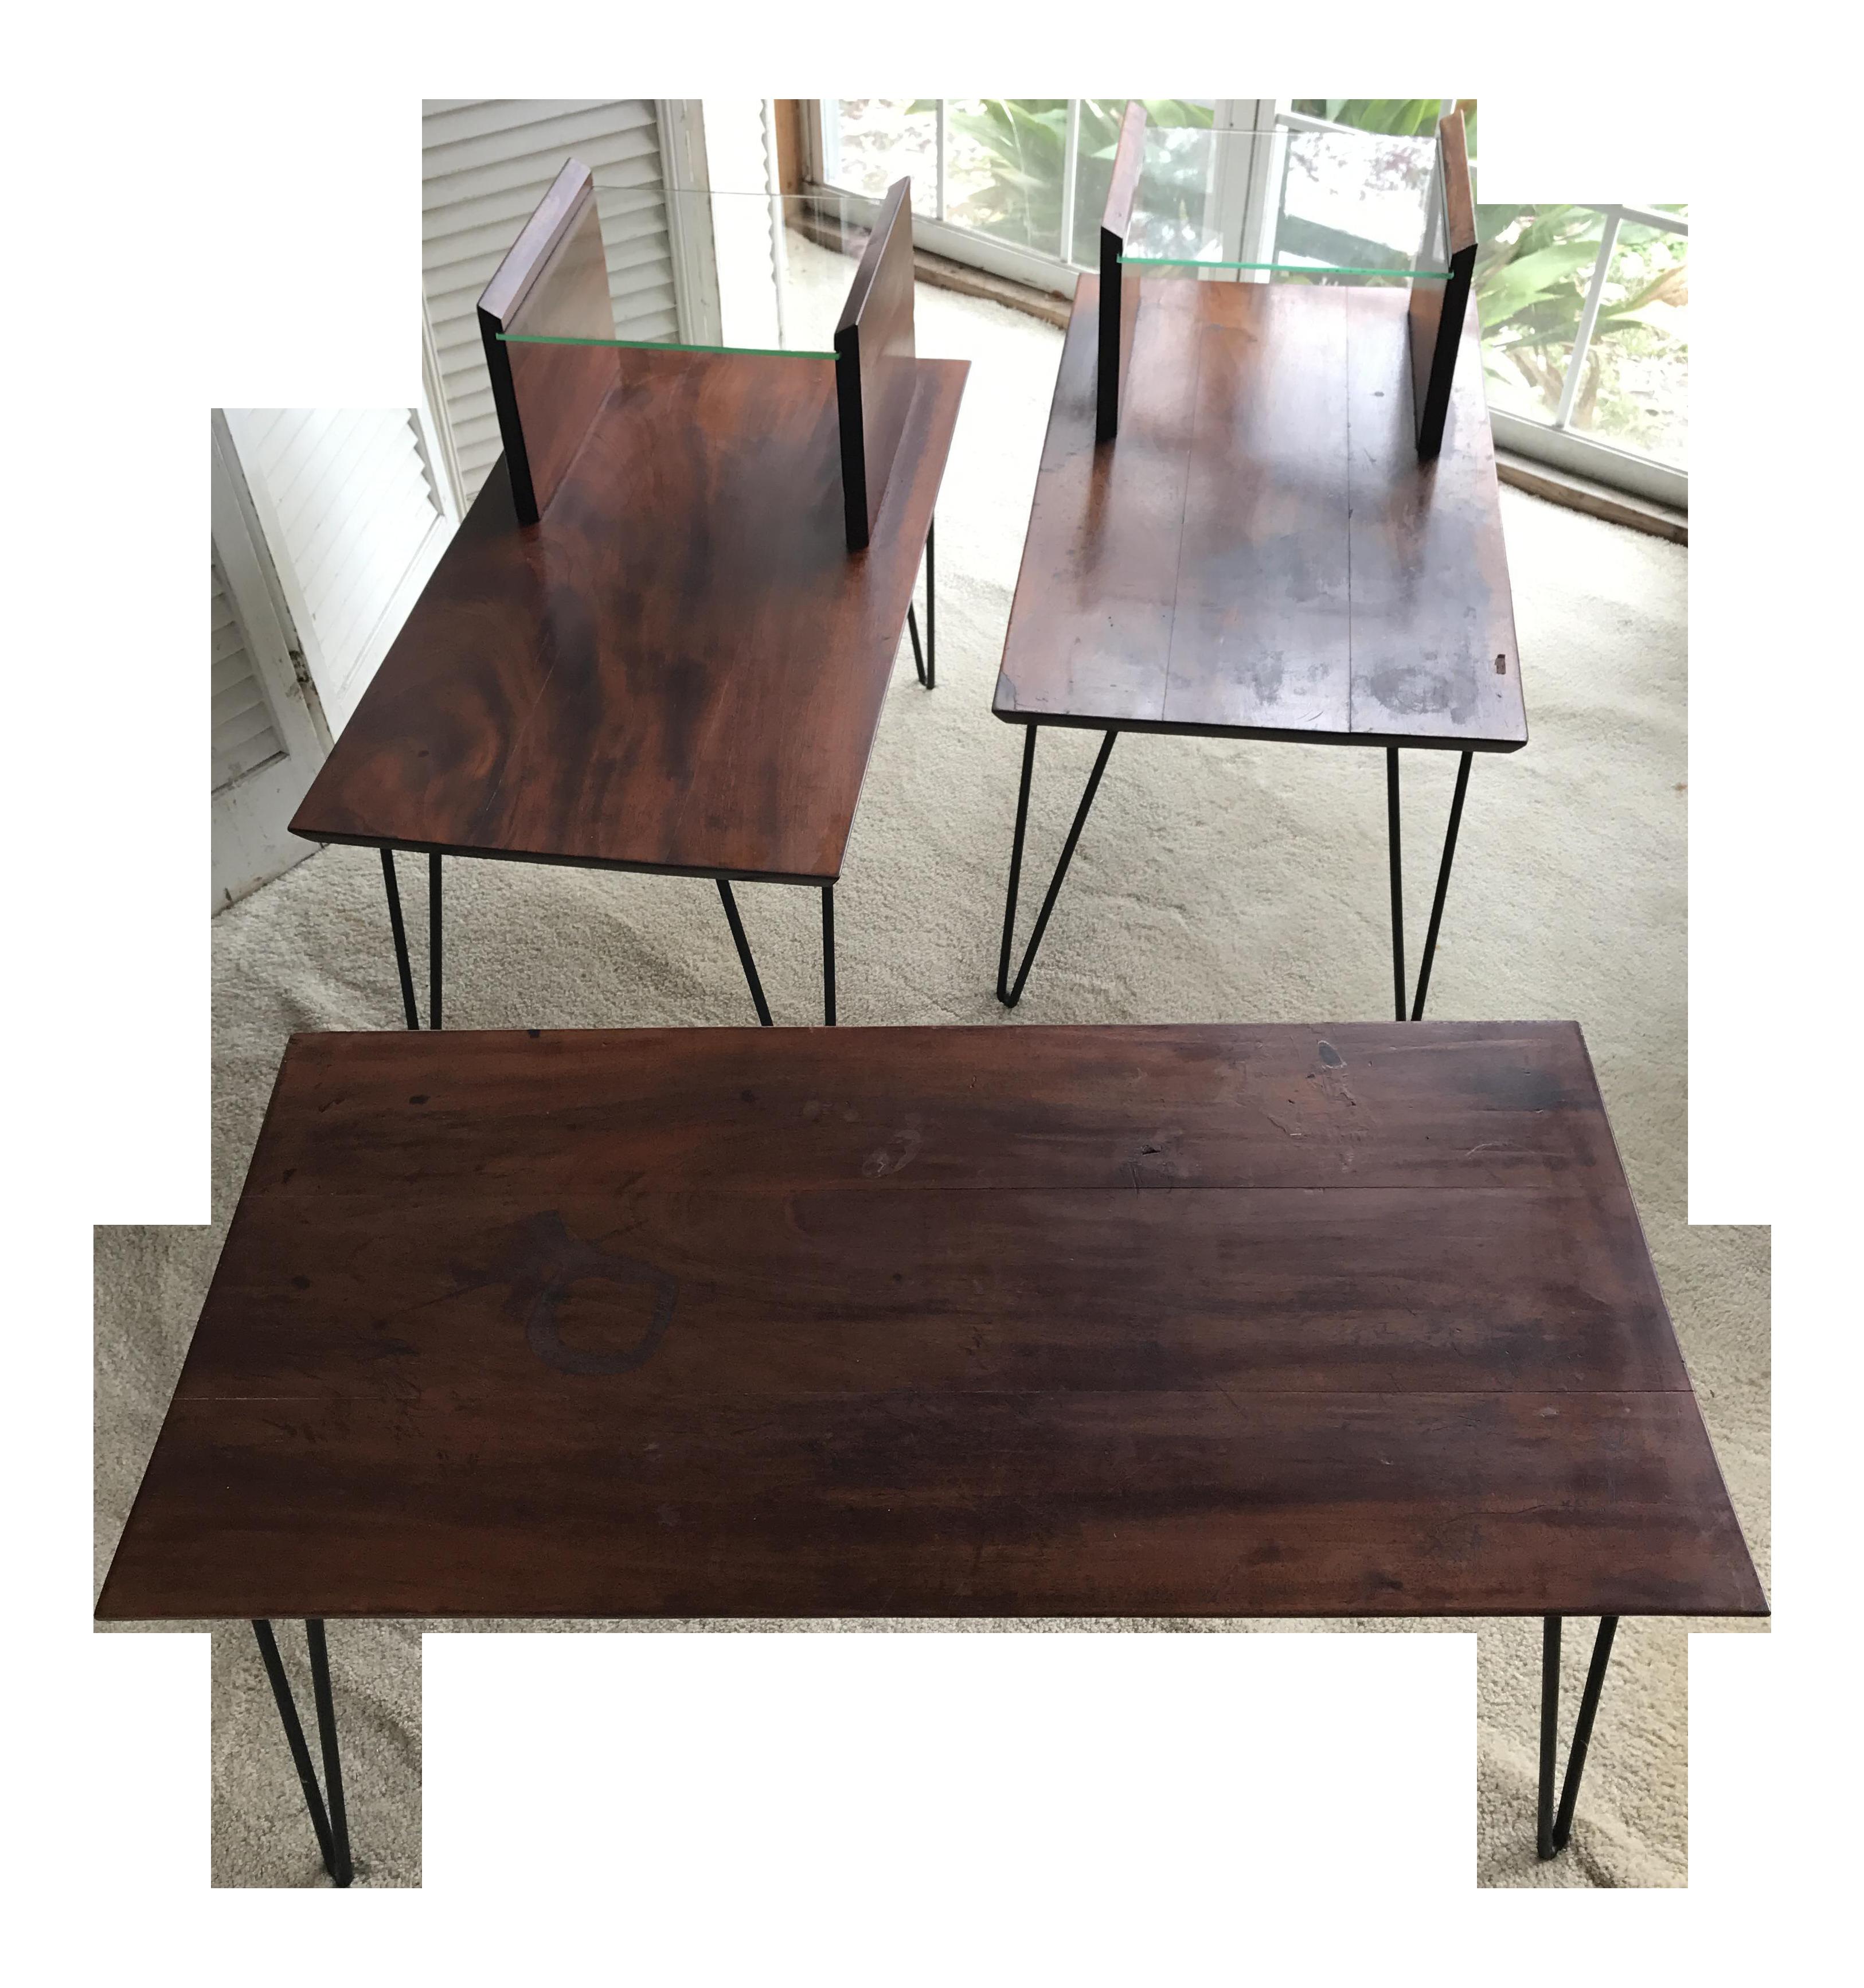 mcm mahogany coffee & end tables -designer raymond loewy 1960's